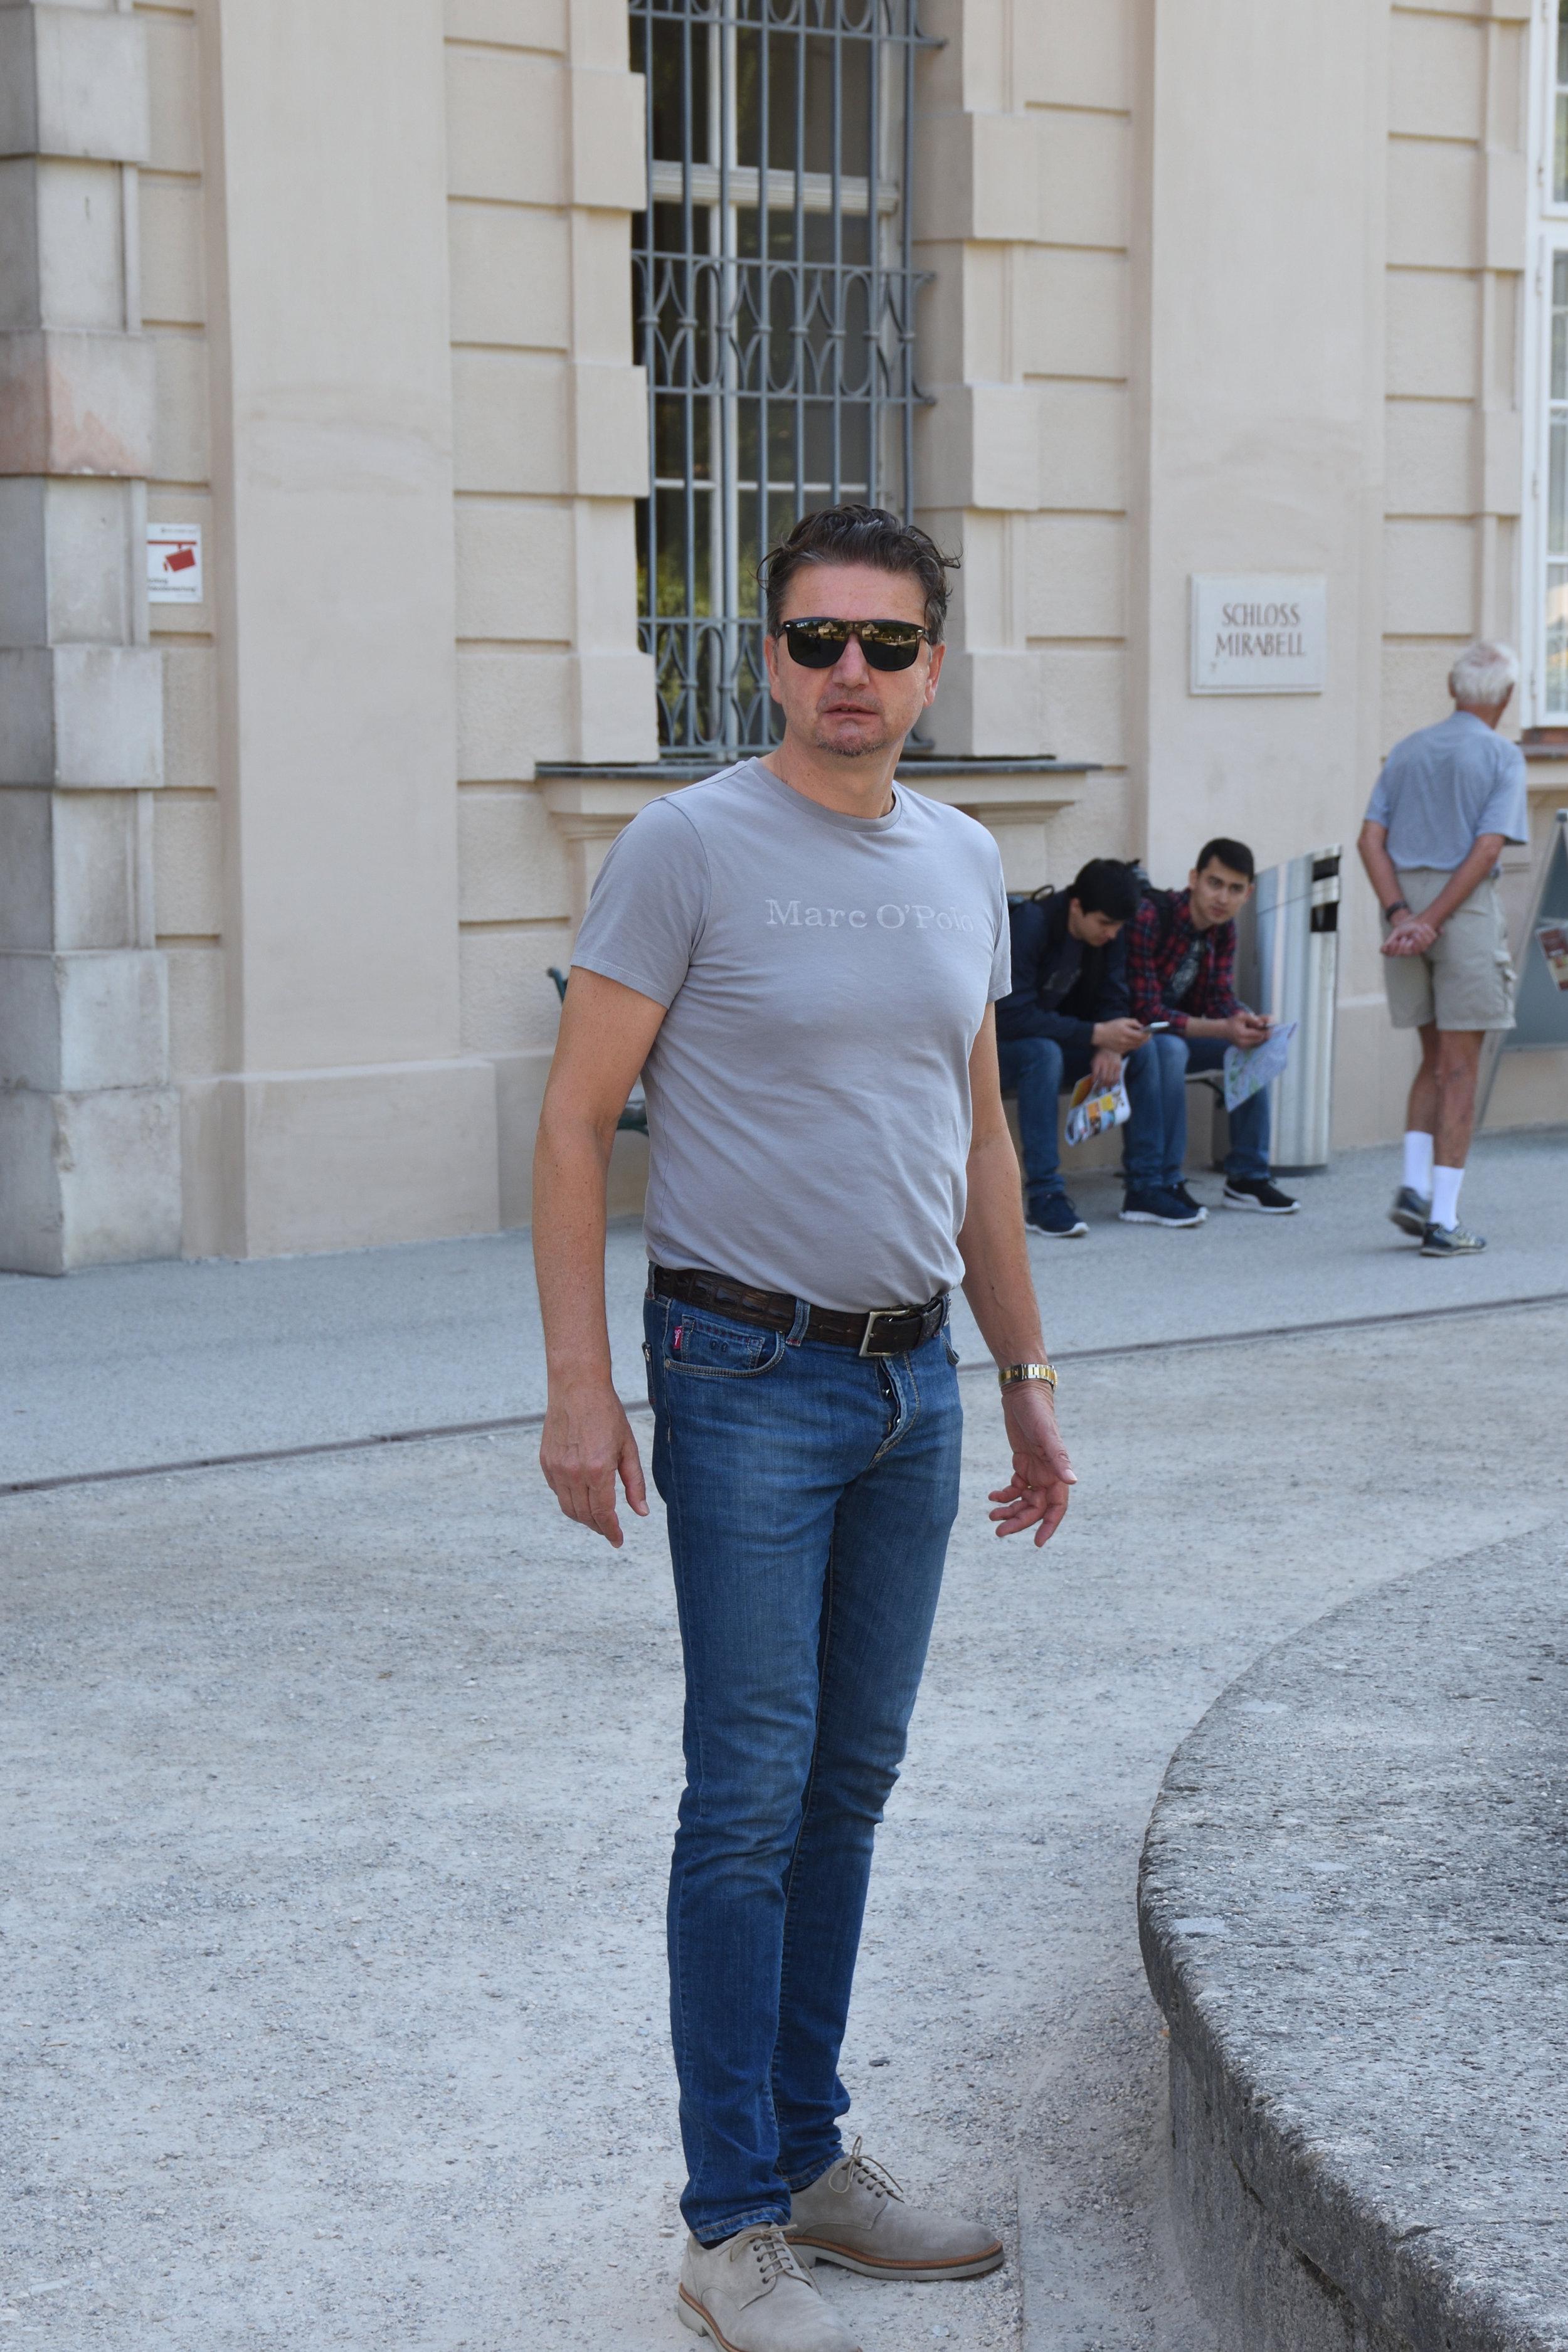 Bojan at Schloss Mirabell, Salzburg, June 2017